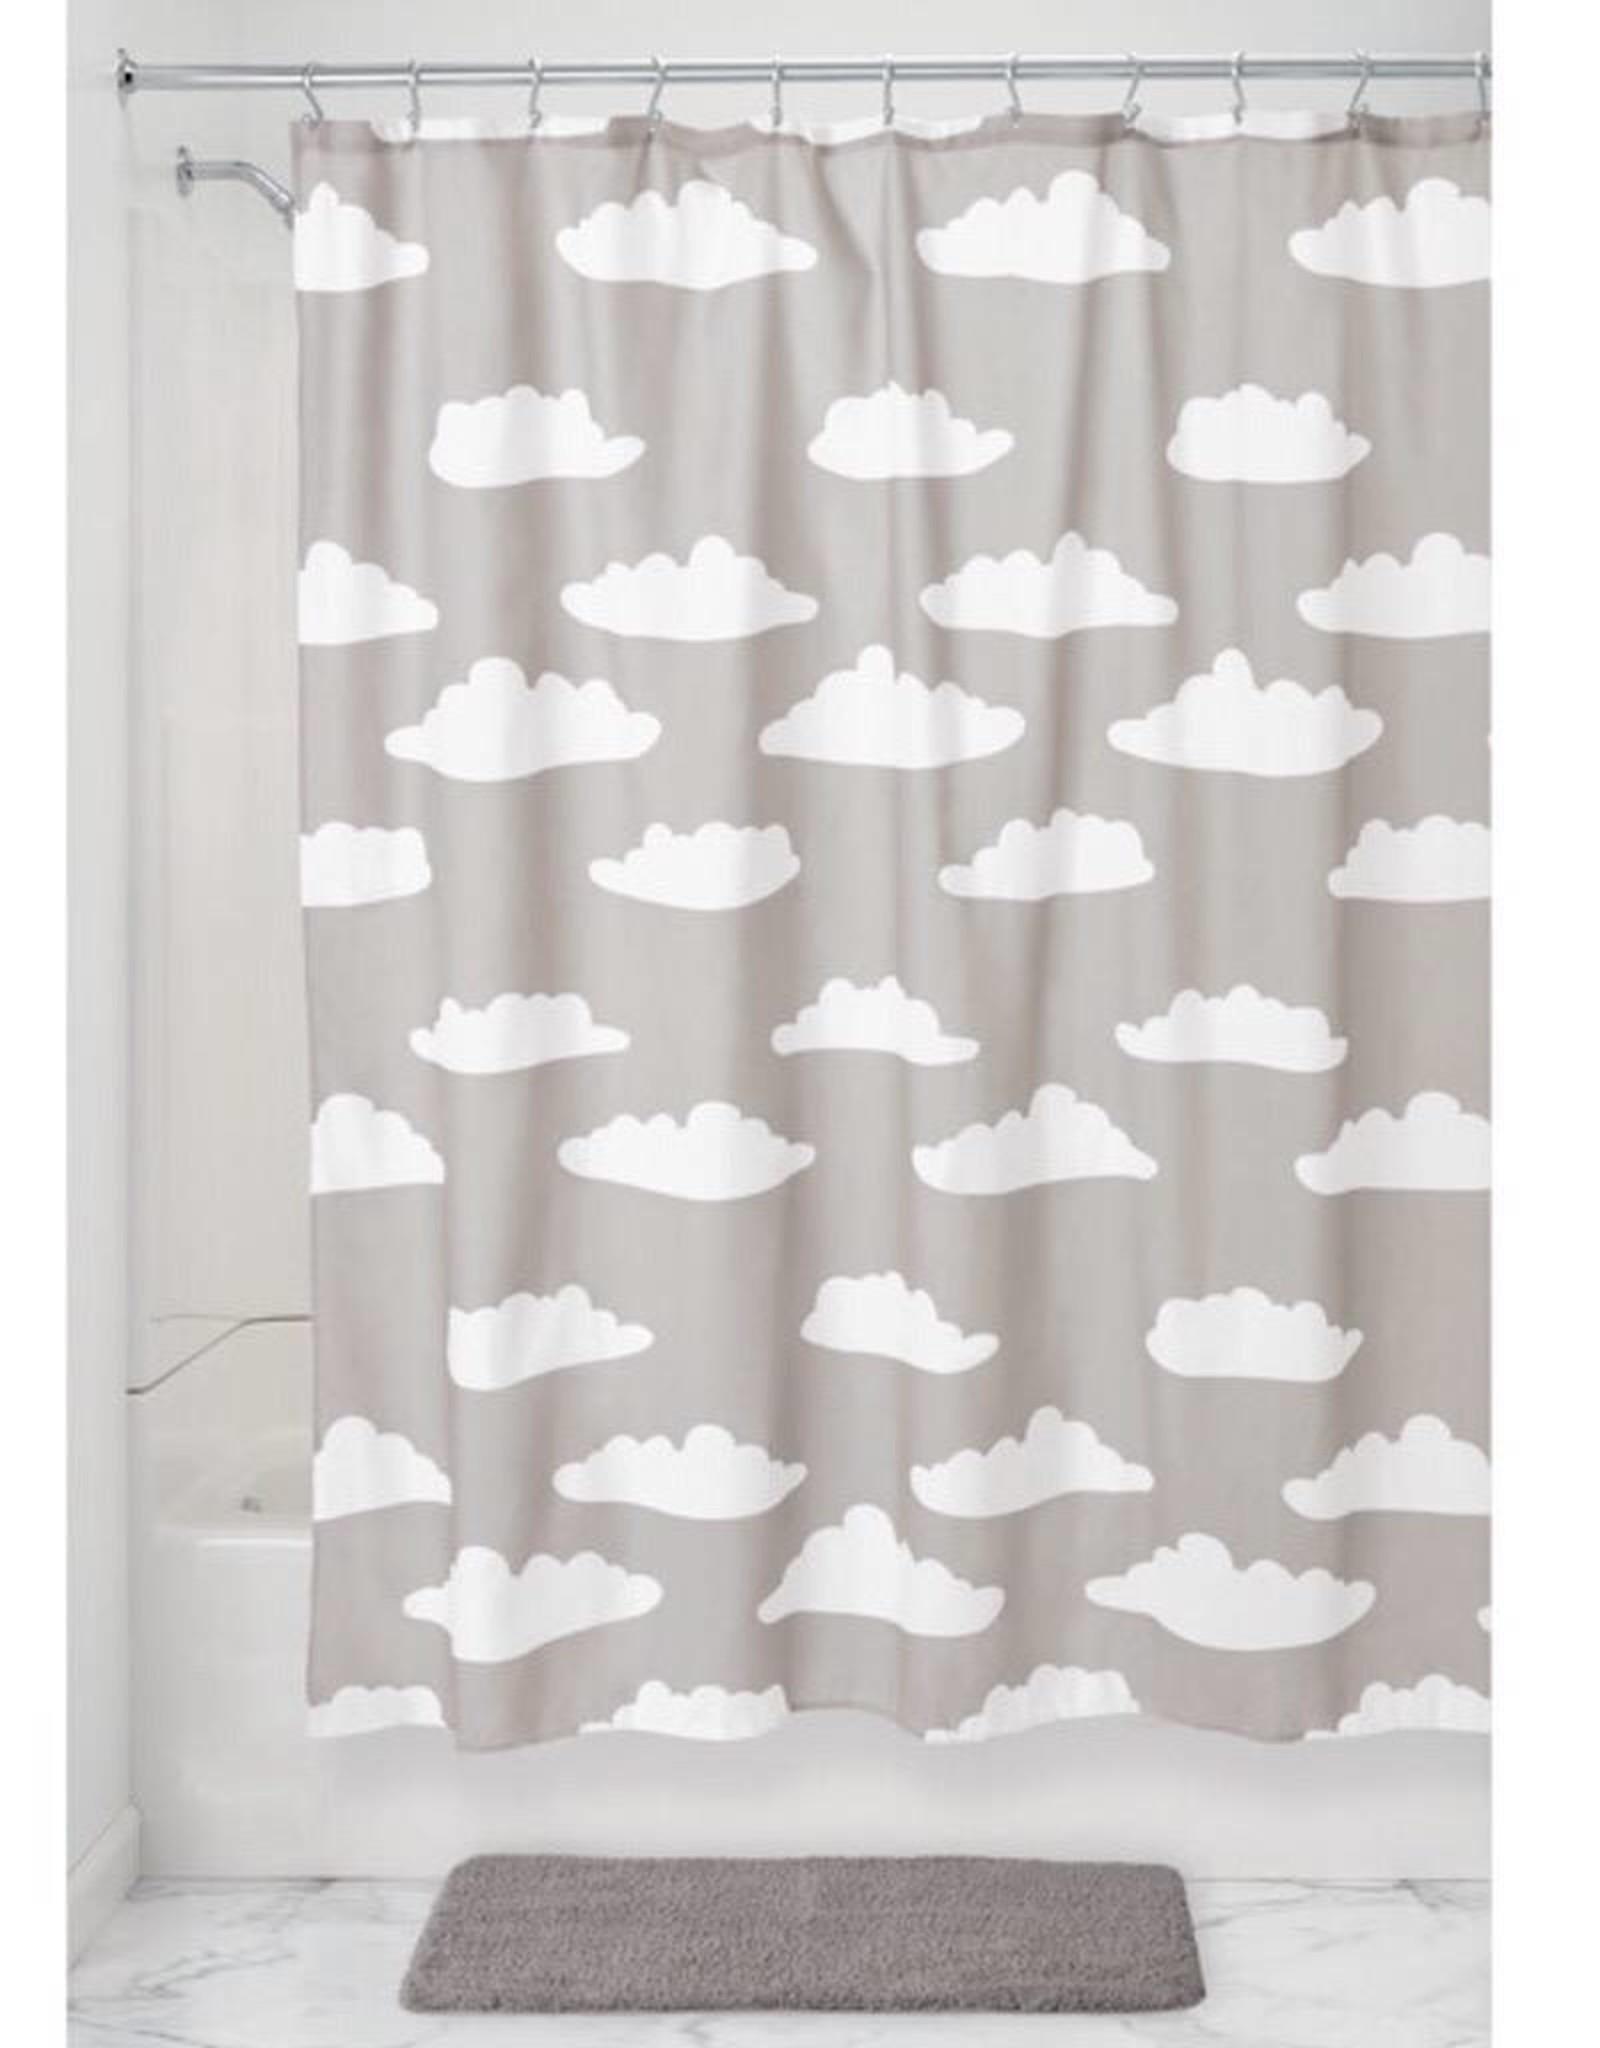 75250 Shower Curtain Cloud SC Gray